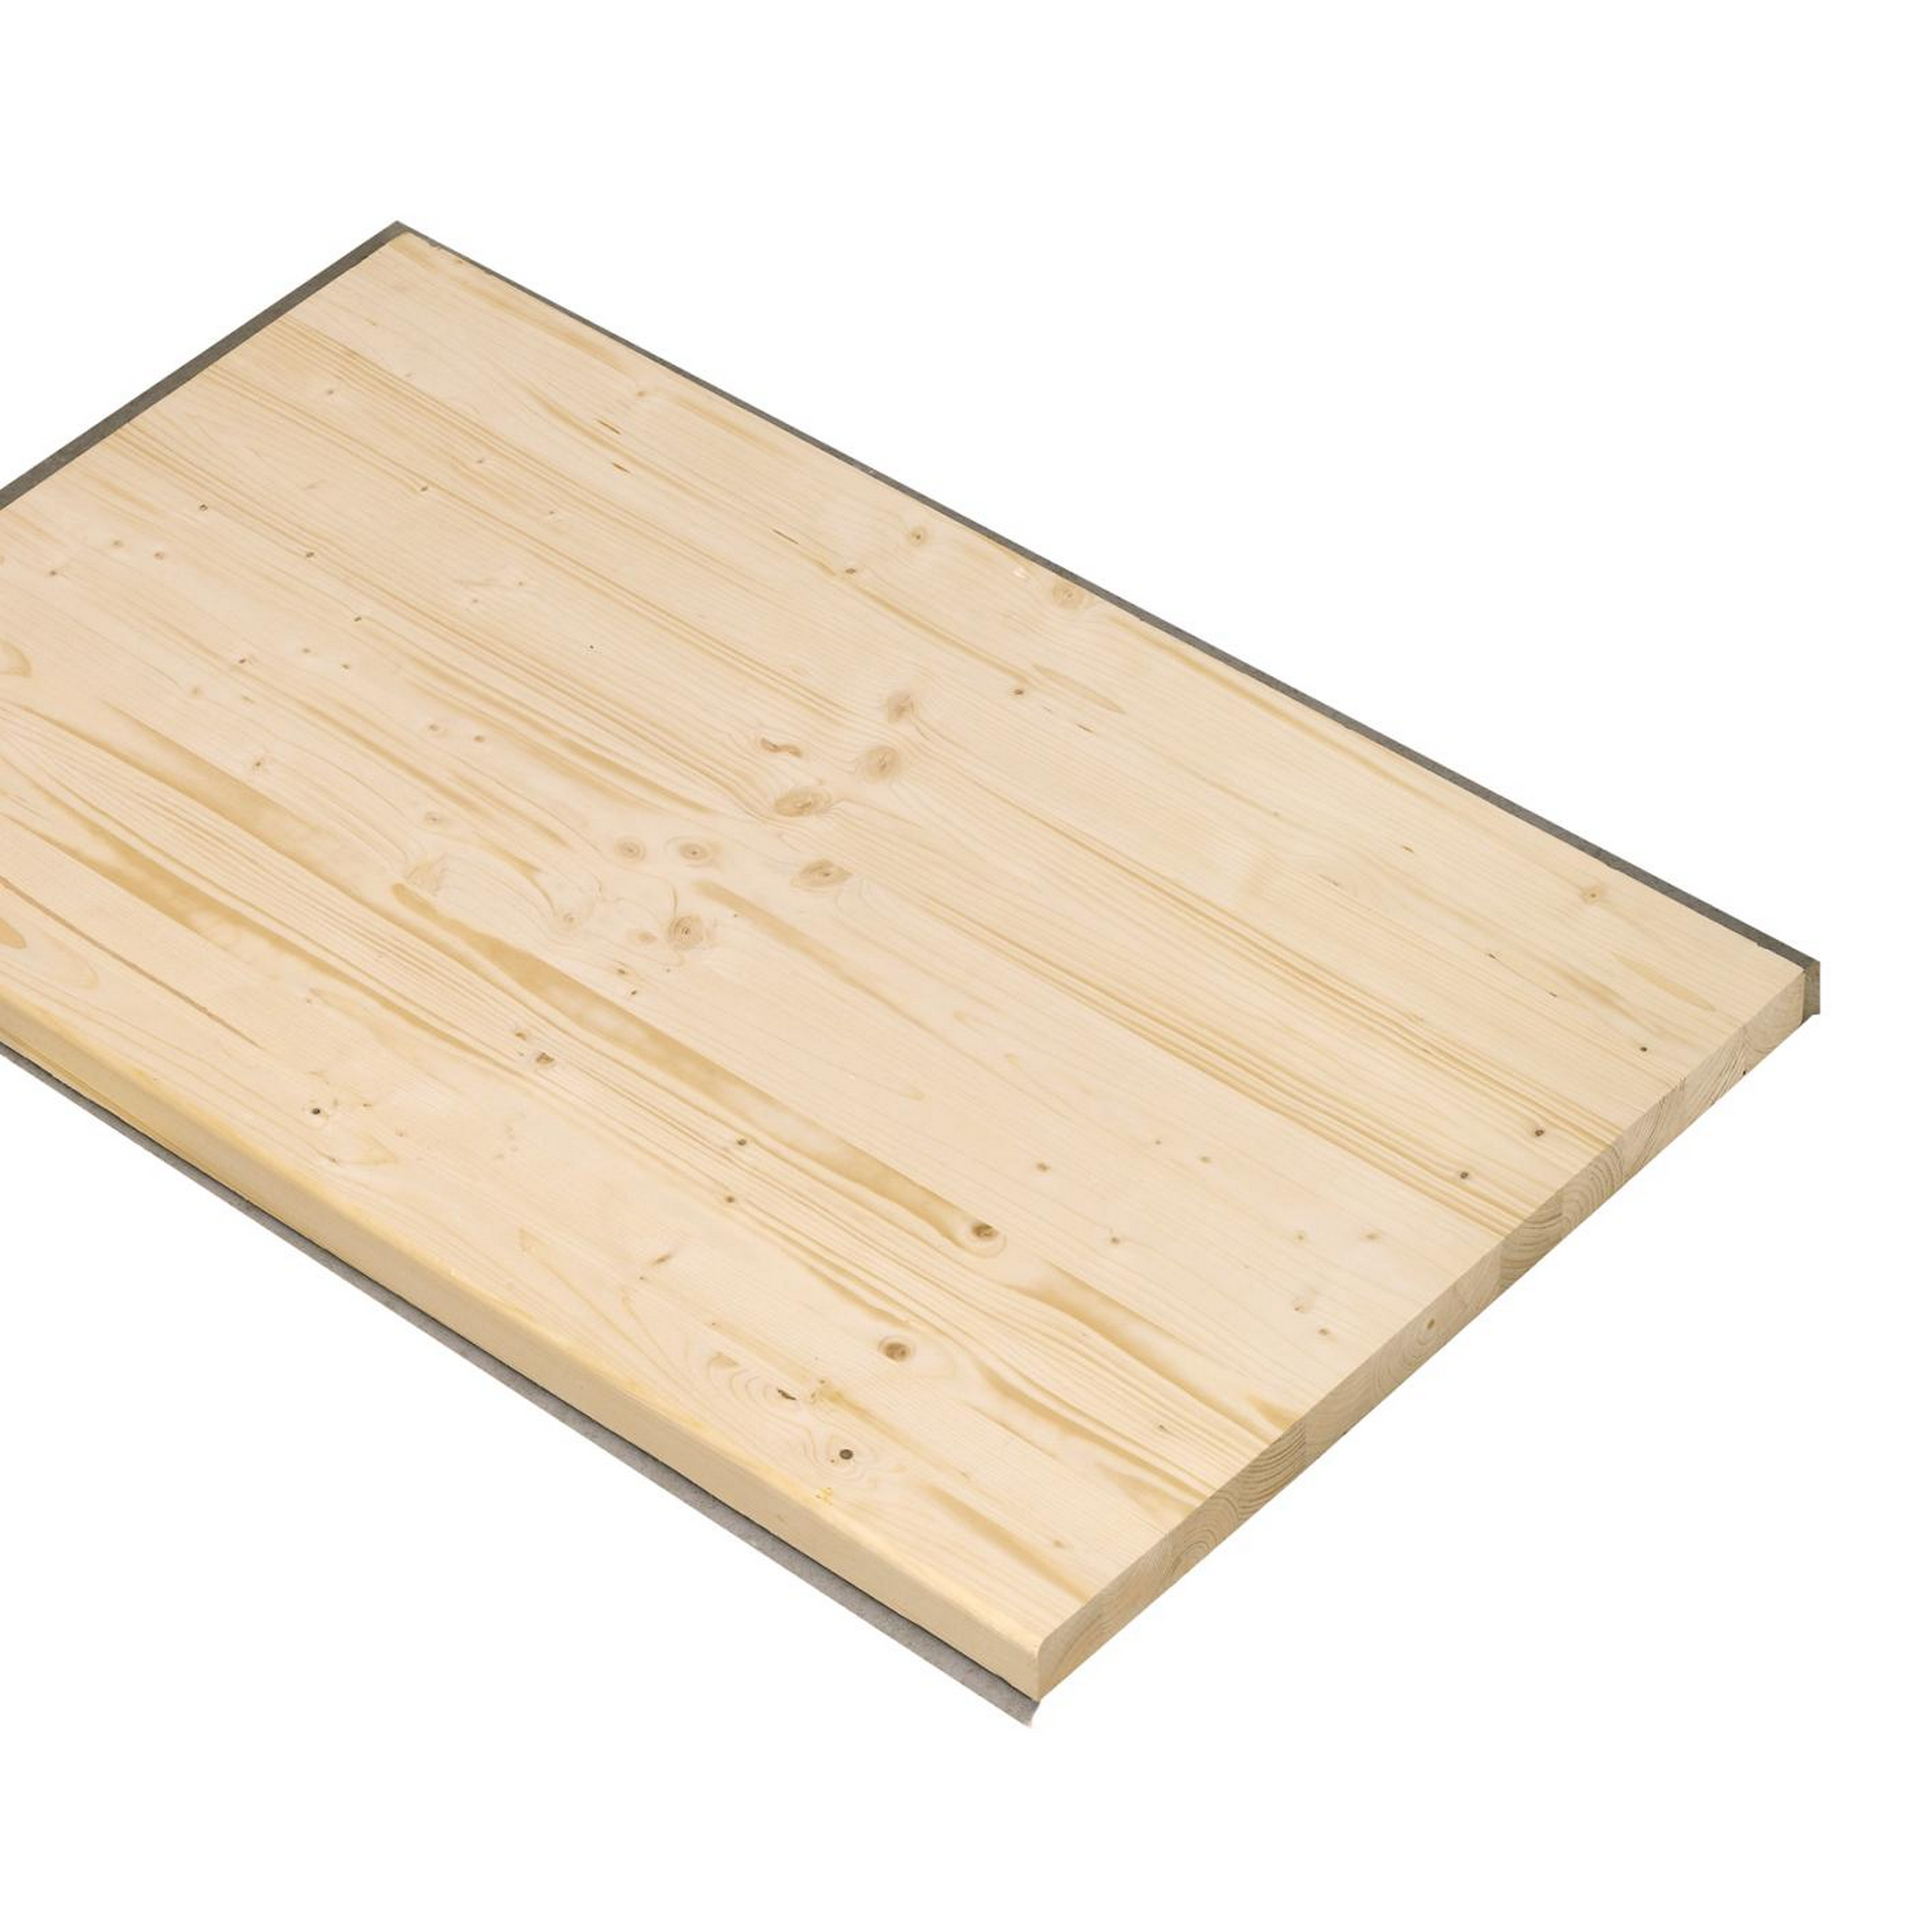 Arbeitsplatte holz massiv  Küchenarbeitsplatten - toom Baumarkt